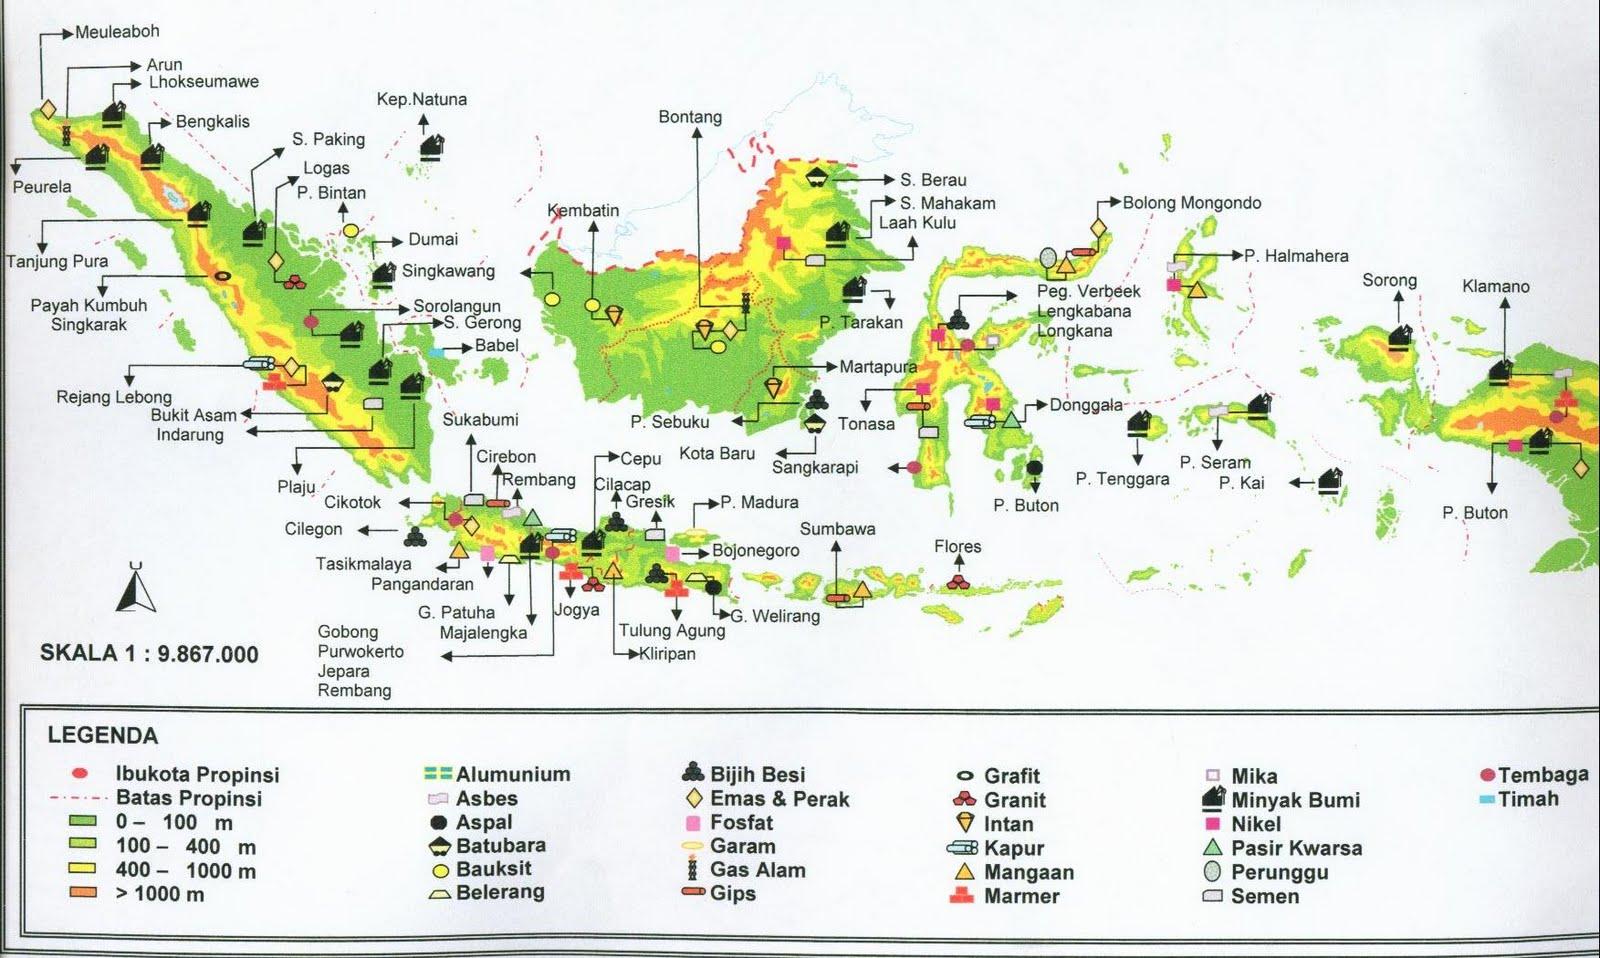 Peta Indonesia Info Barang Tambang Ri Gambar Sketsa